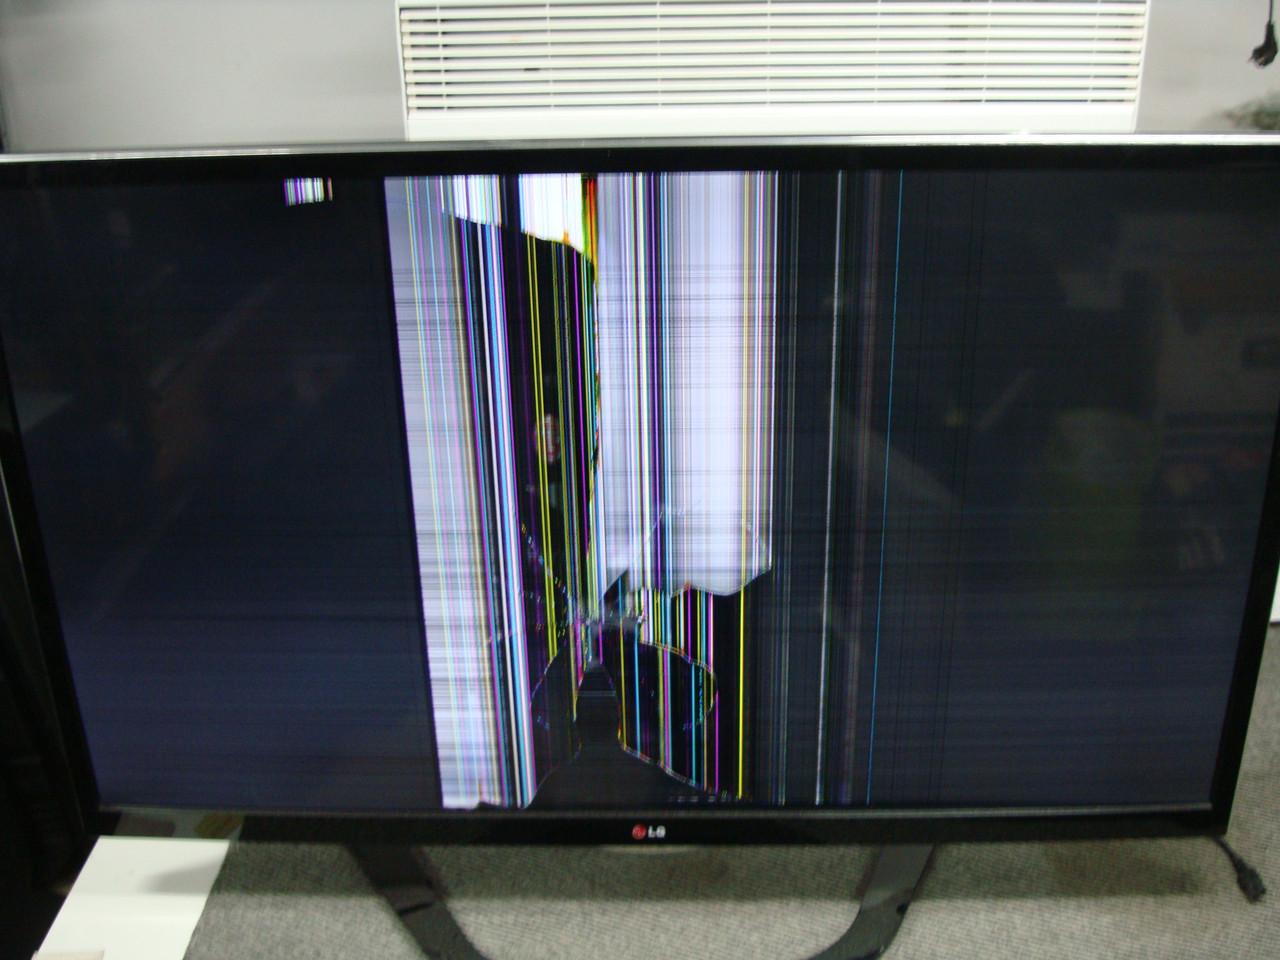 Запчасти к телевизору LG 42LA644V 42 дюйма (EAX64908001, LC470DUE-SFR1 6870C-0444A, 6917L-0119C 3PHCC20006C-H)